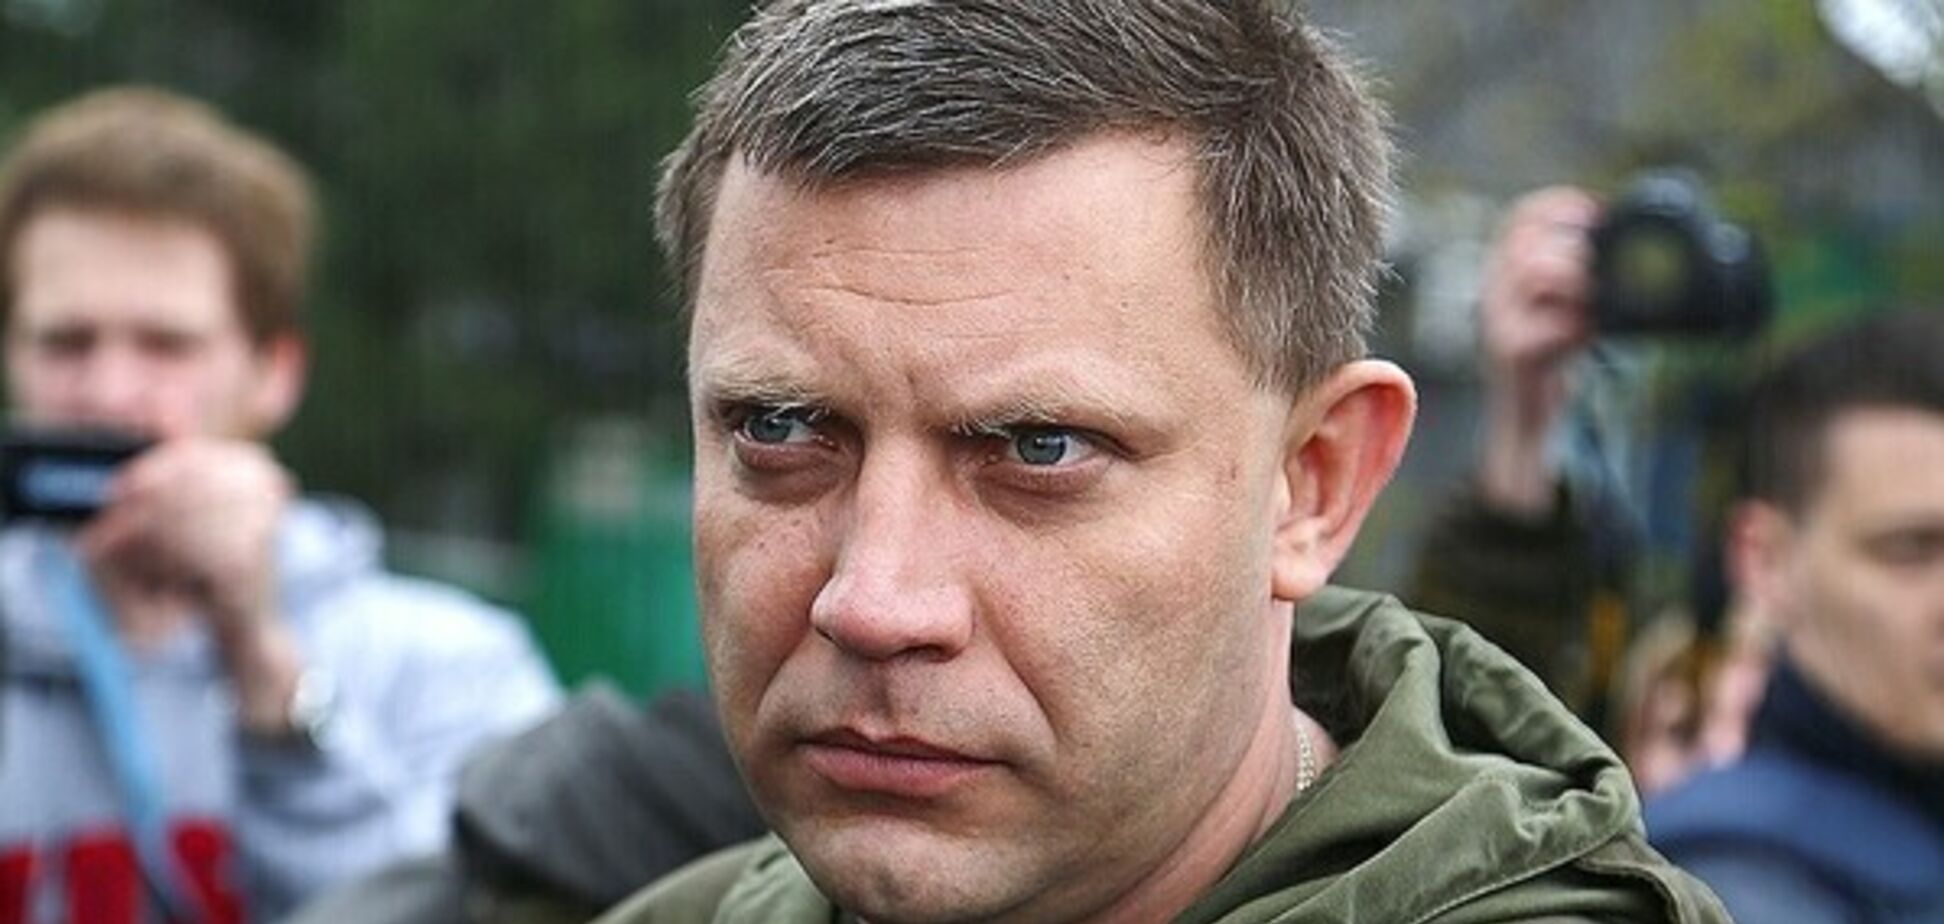 Ликвидация Захарченко: в 'ДНР' официально назвали 'убийц'